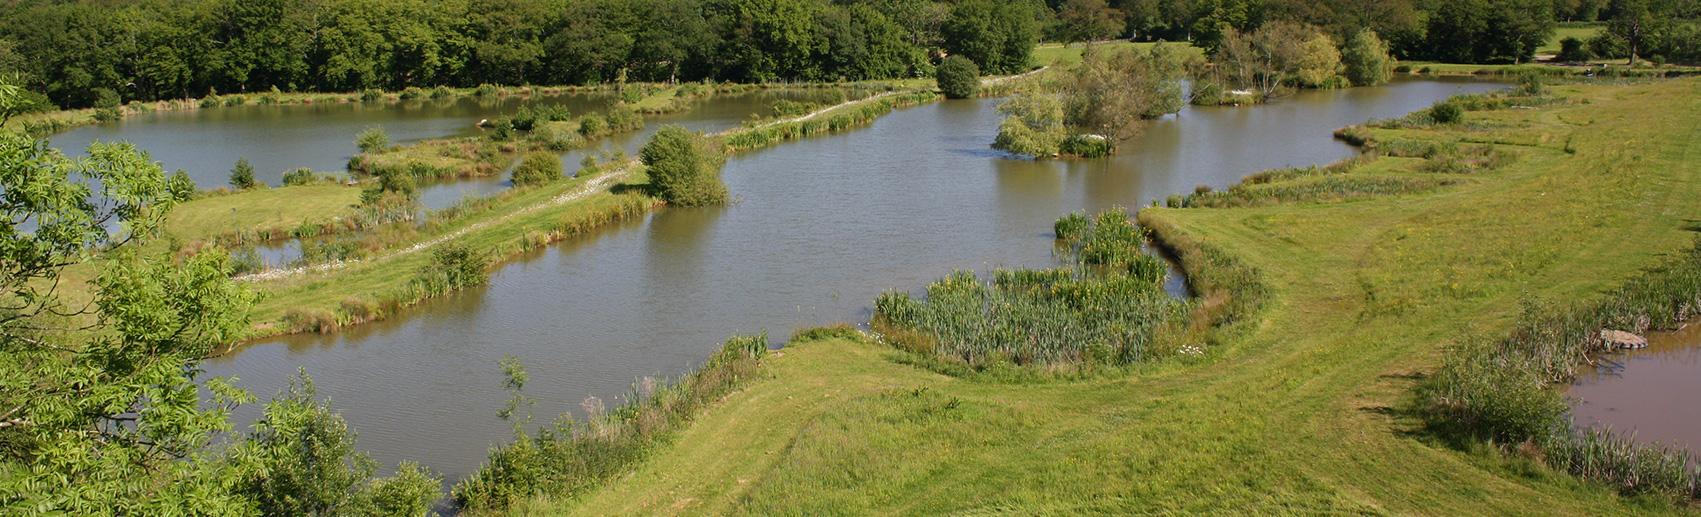 clover fishing lake - newdigate farms estate